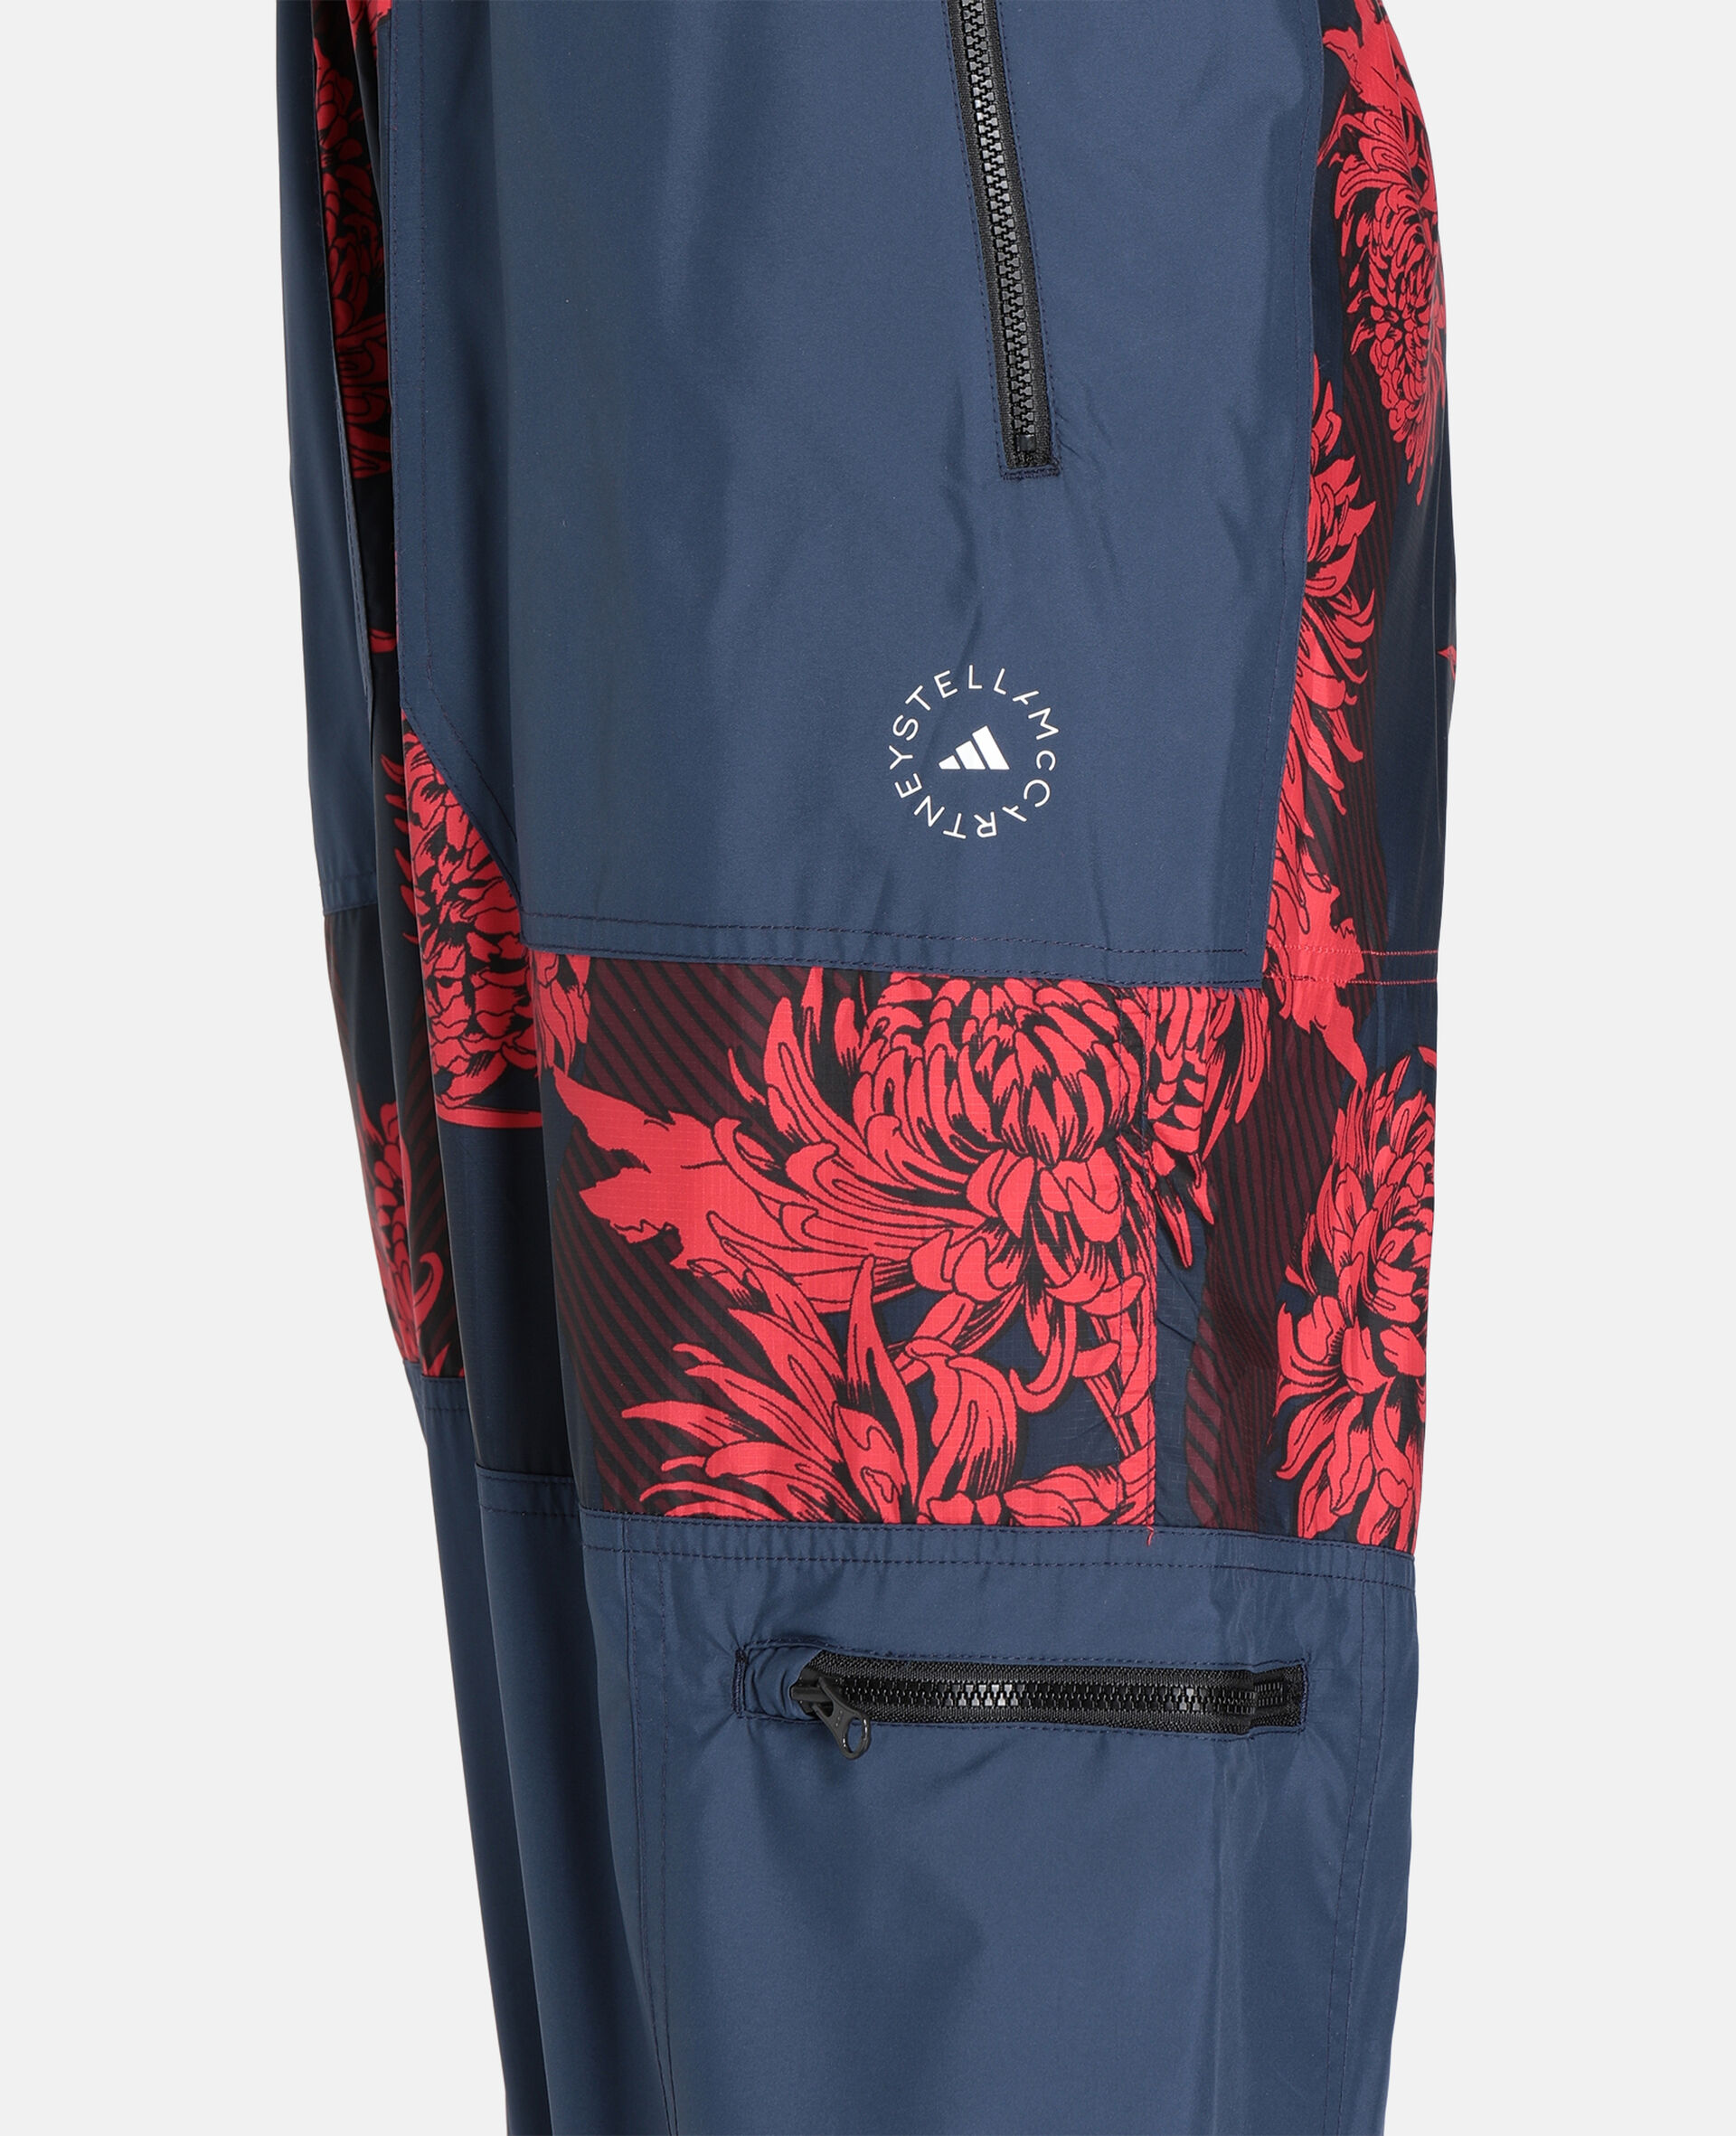 Future Playground 机织 Training 裤装-红色-large image number 3